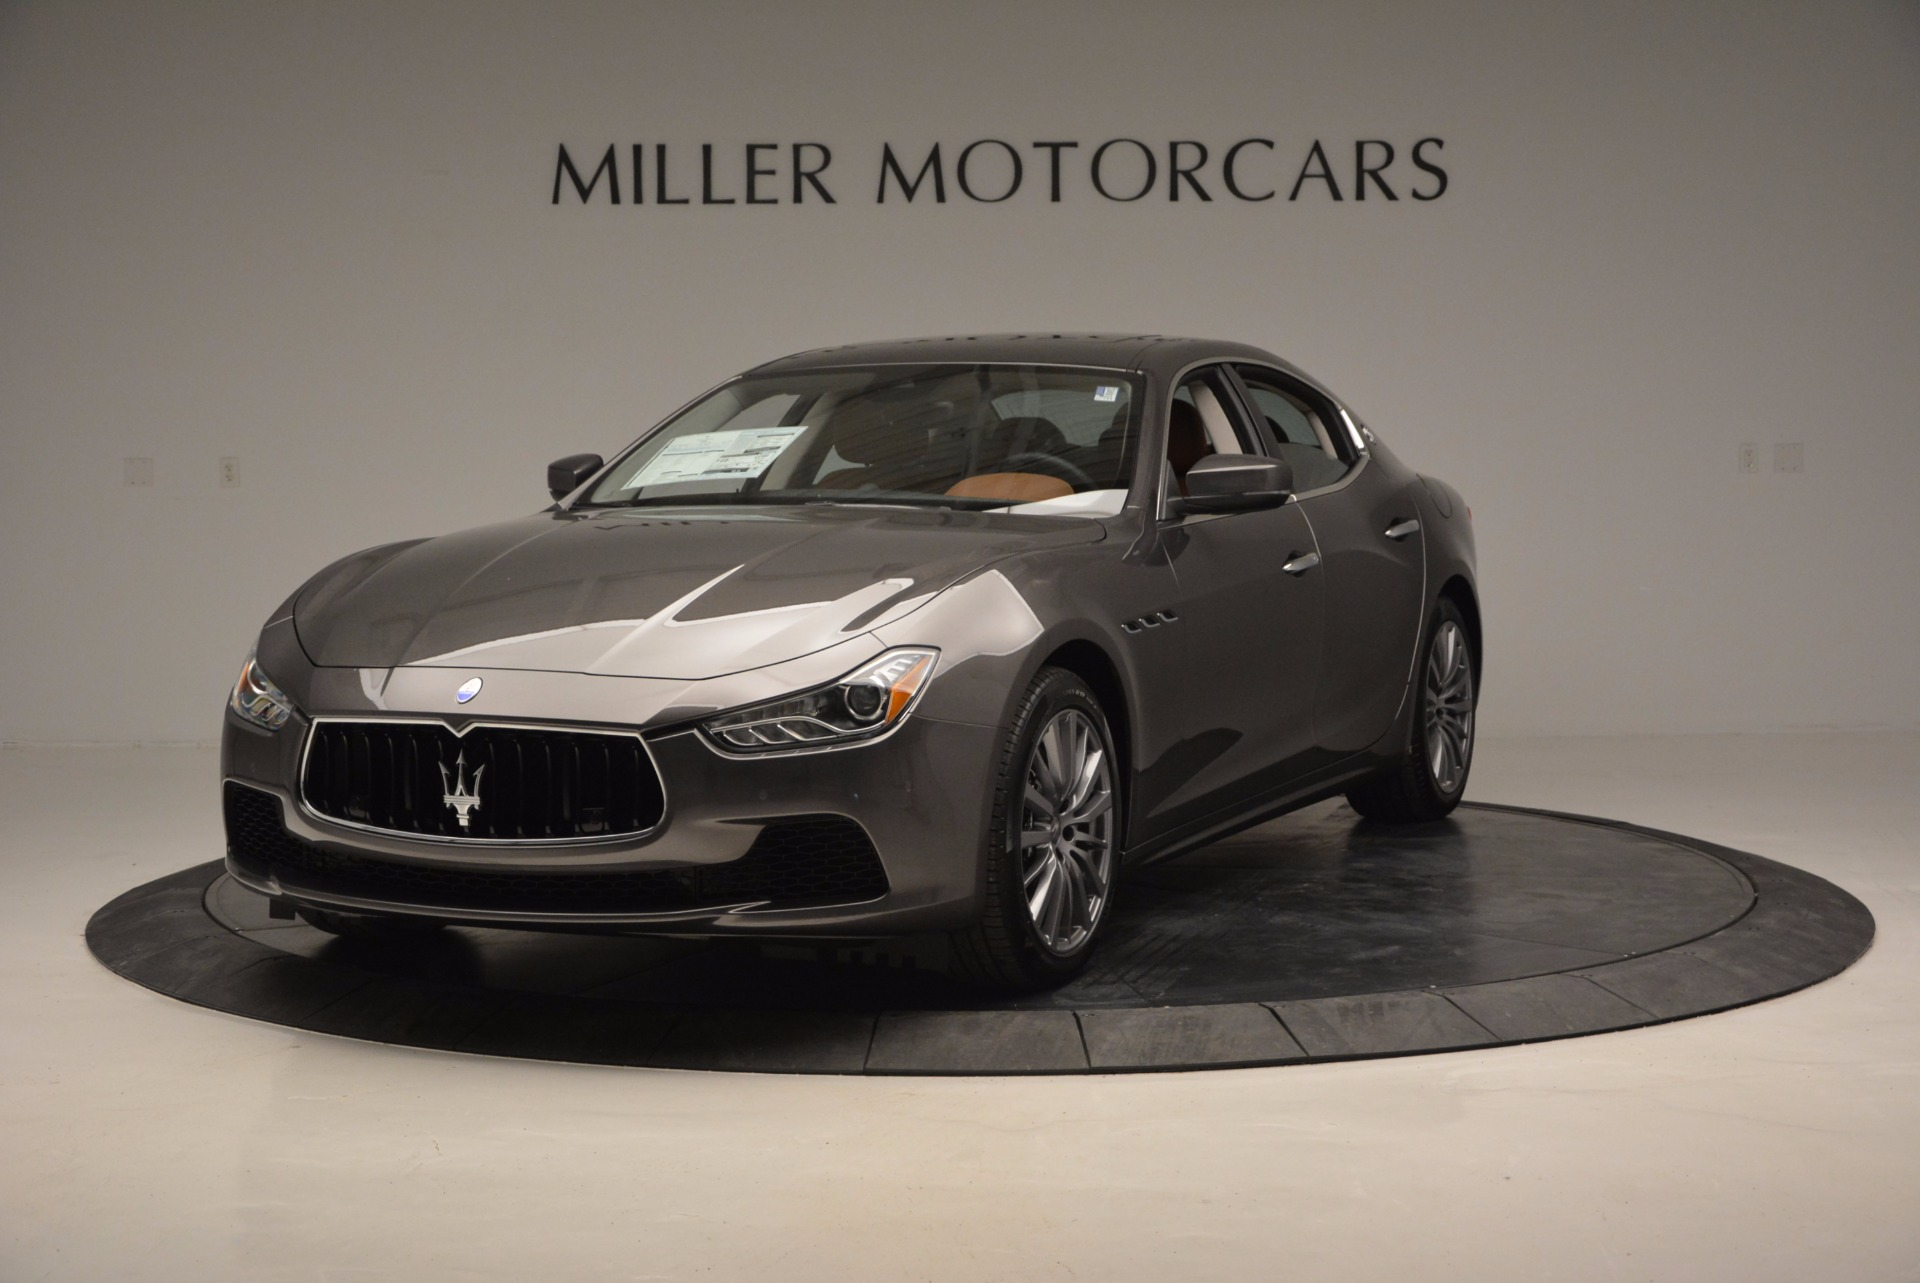 New 2017 Maserati Ghibli S Q4 For Sale In Greenwich, CT. Alfa Romeo of Greenwich, M1733 715_main